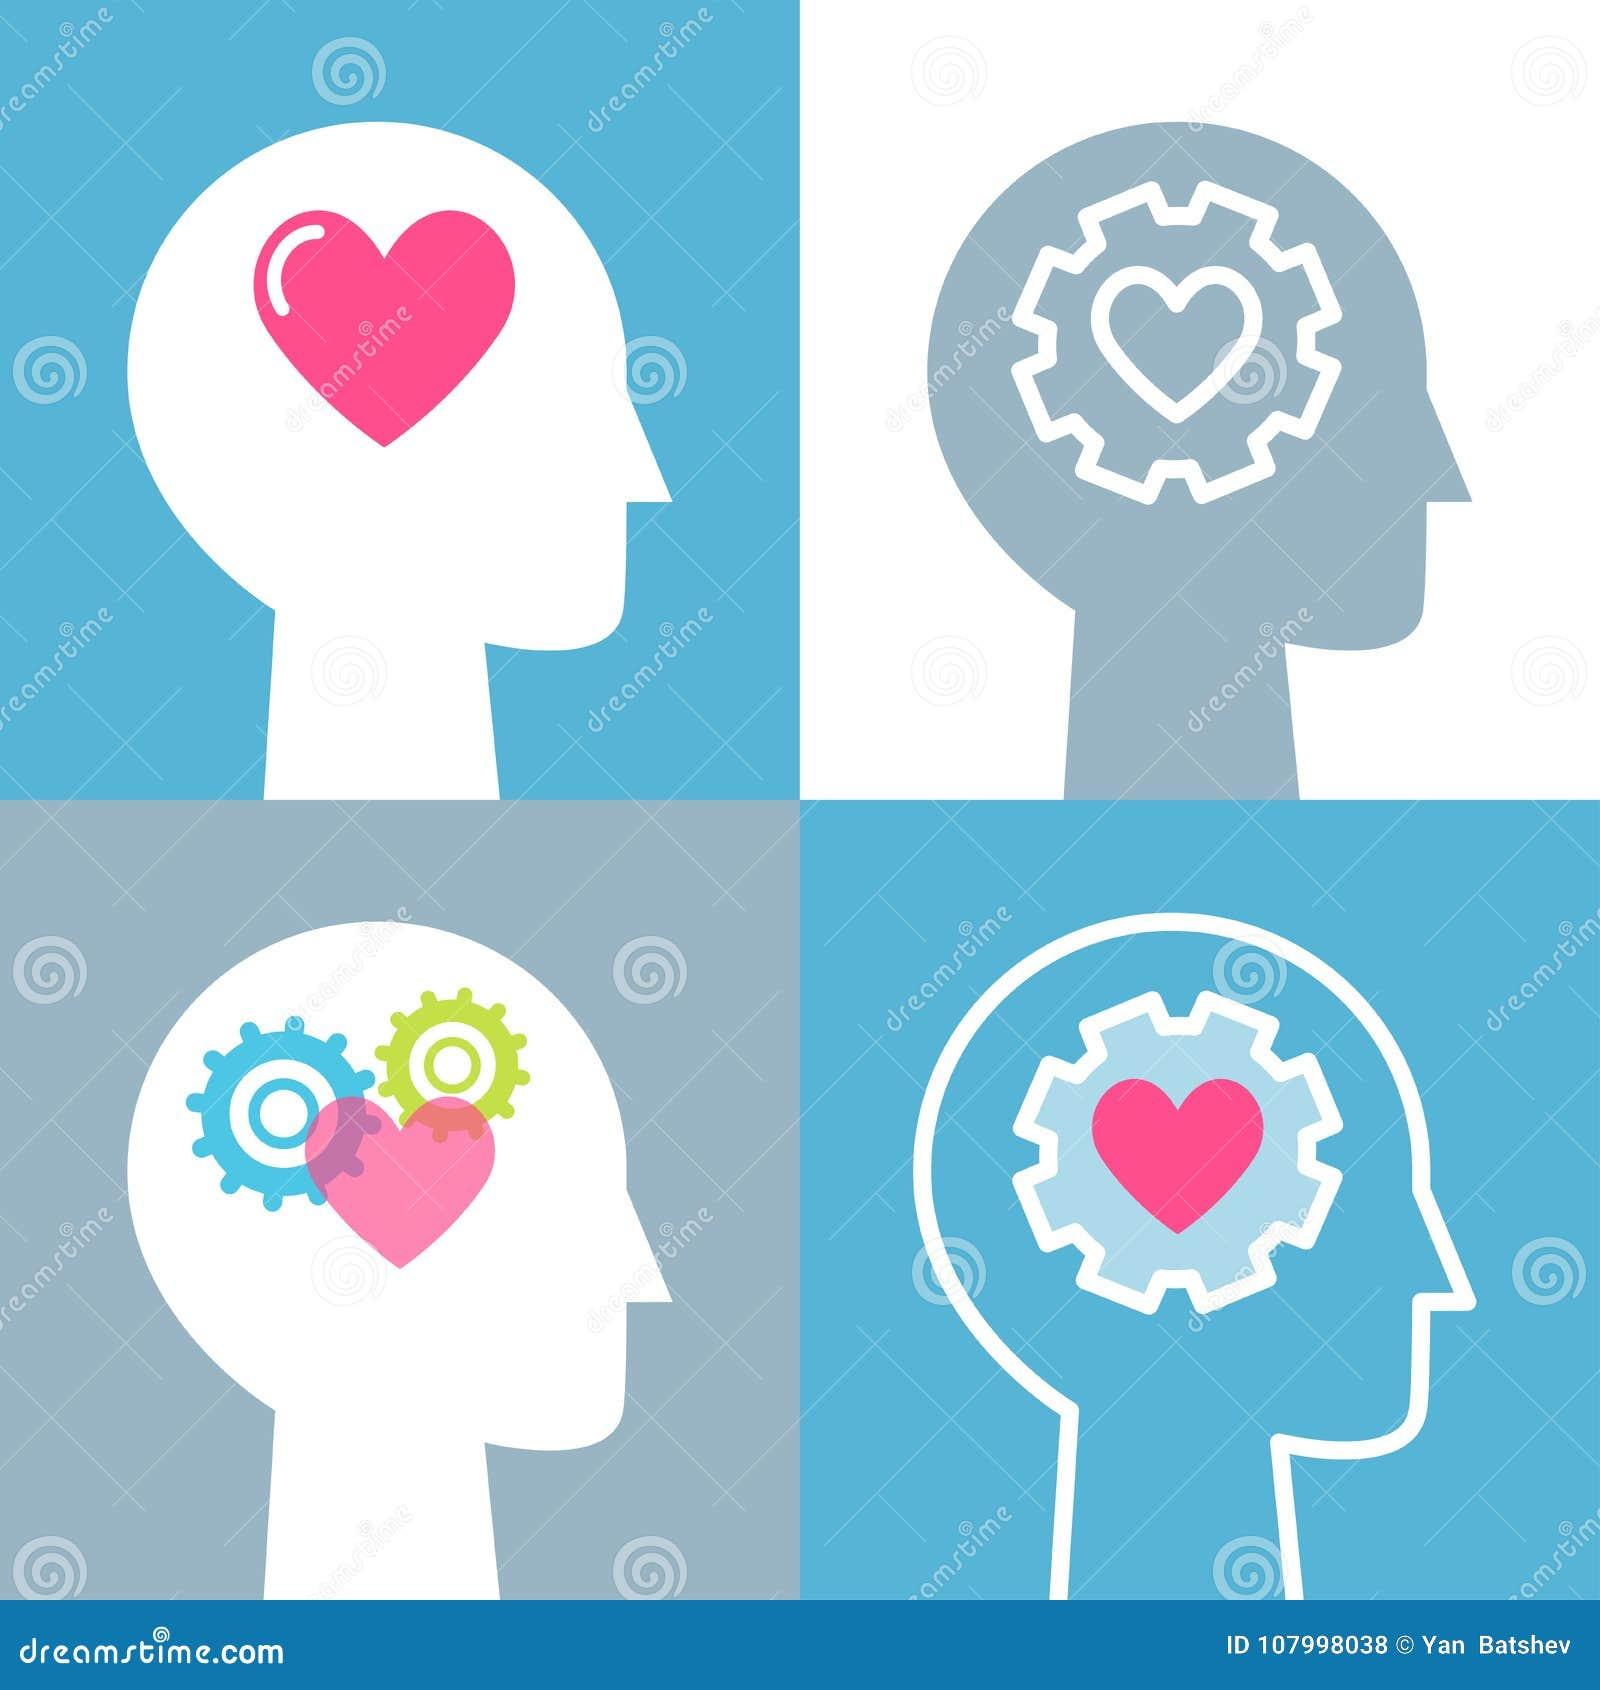 Emotional Intelligence, Feeling and Mental Health Concept Vector Illustrations Set